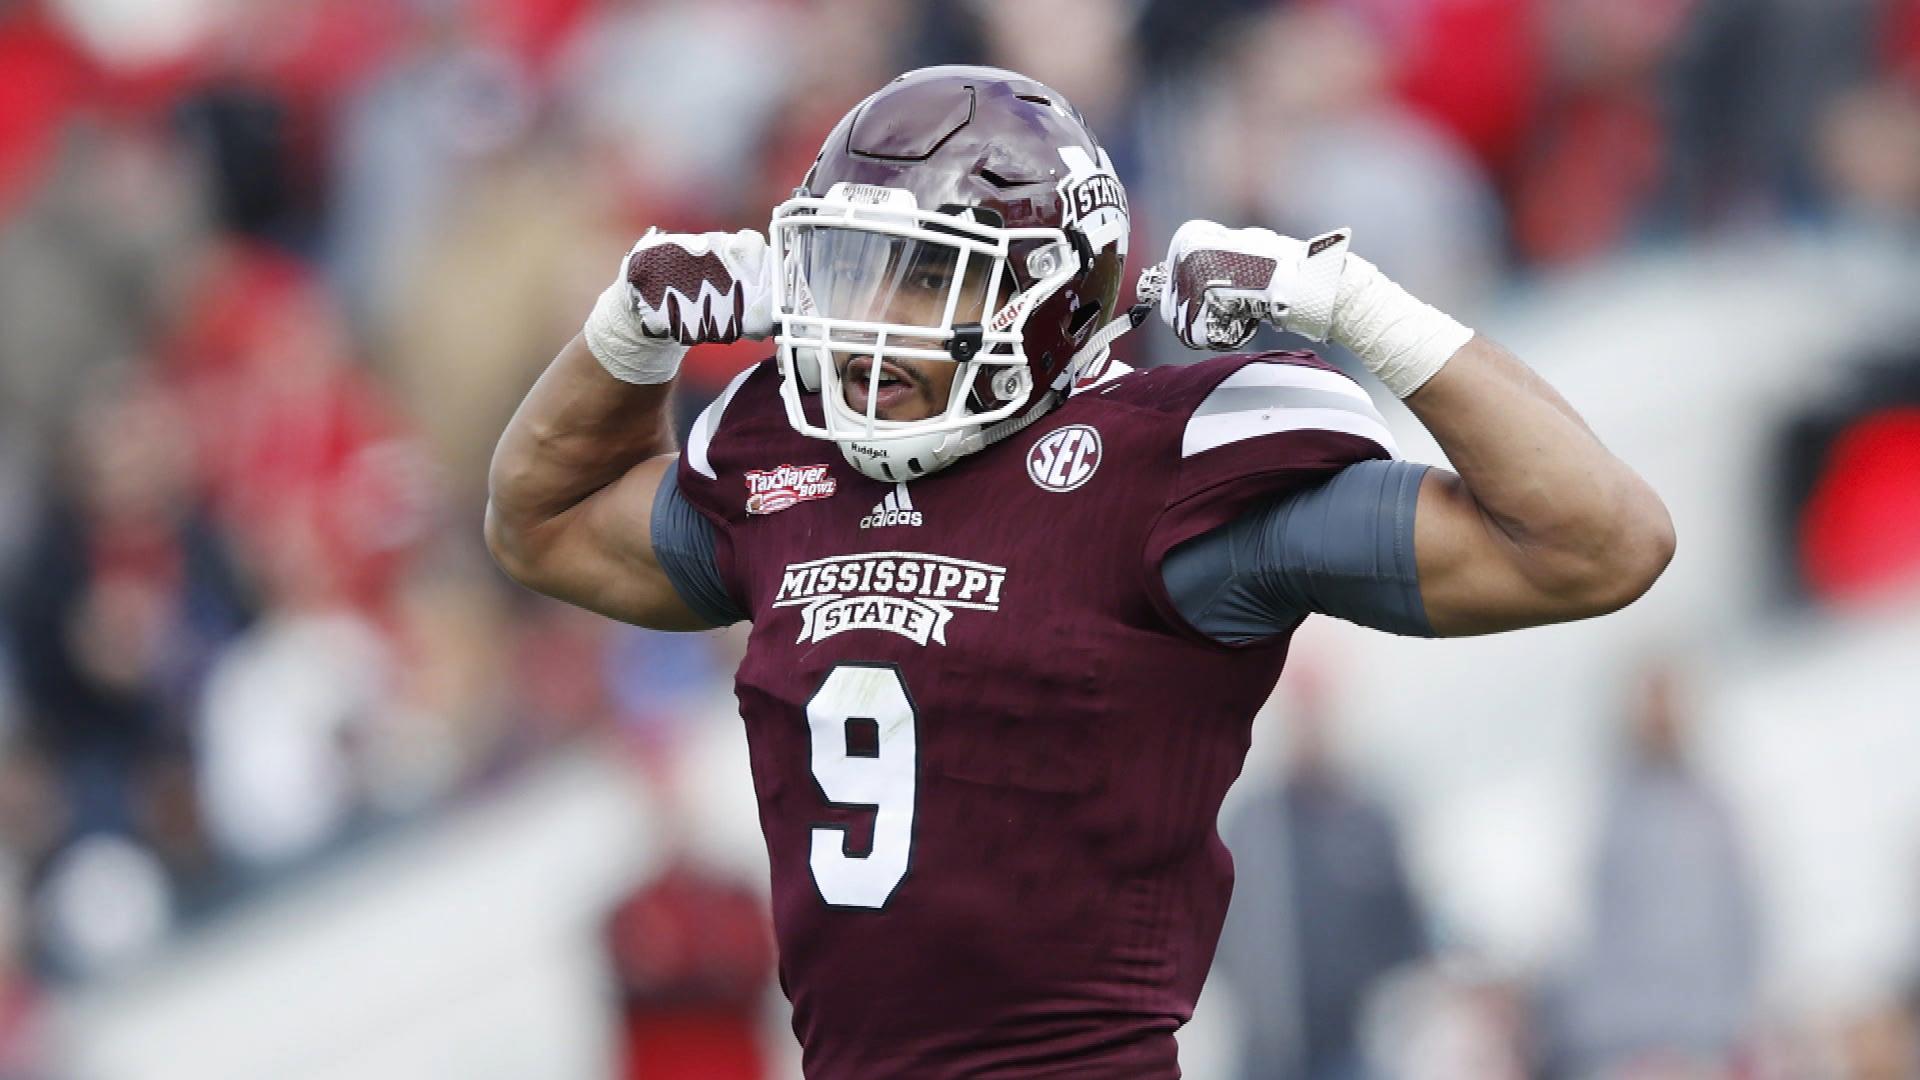 2019 NFL Draft: Redskins saw plenty of value in Montez Sweat at 26